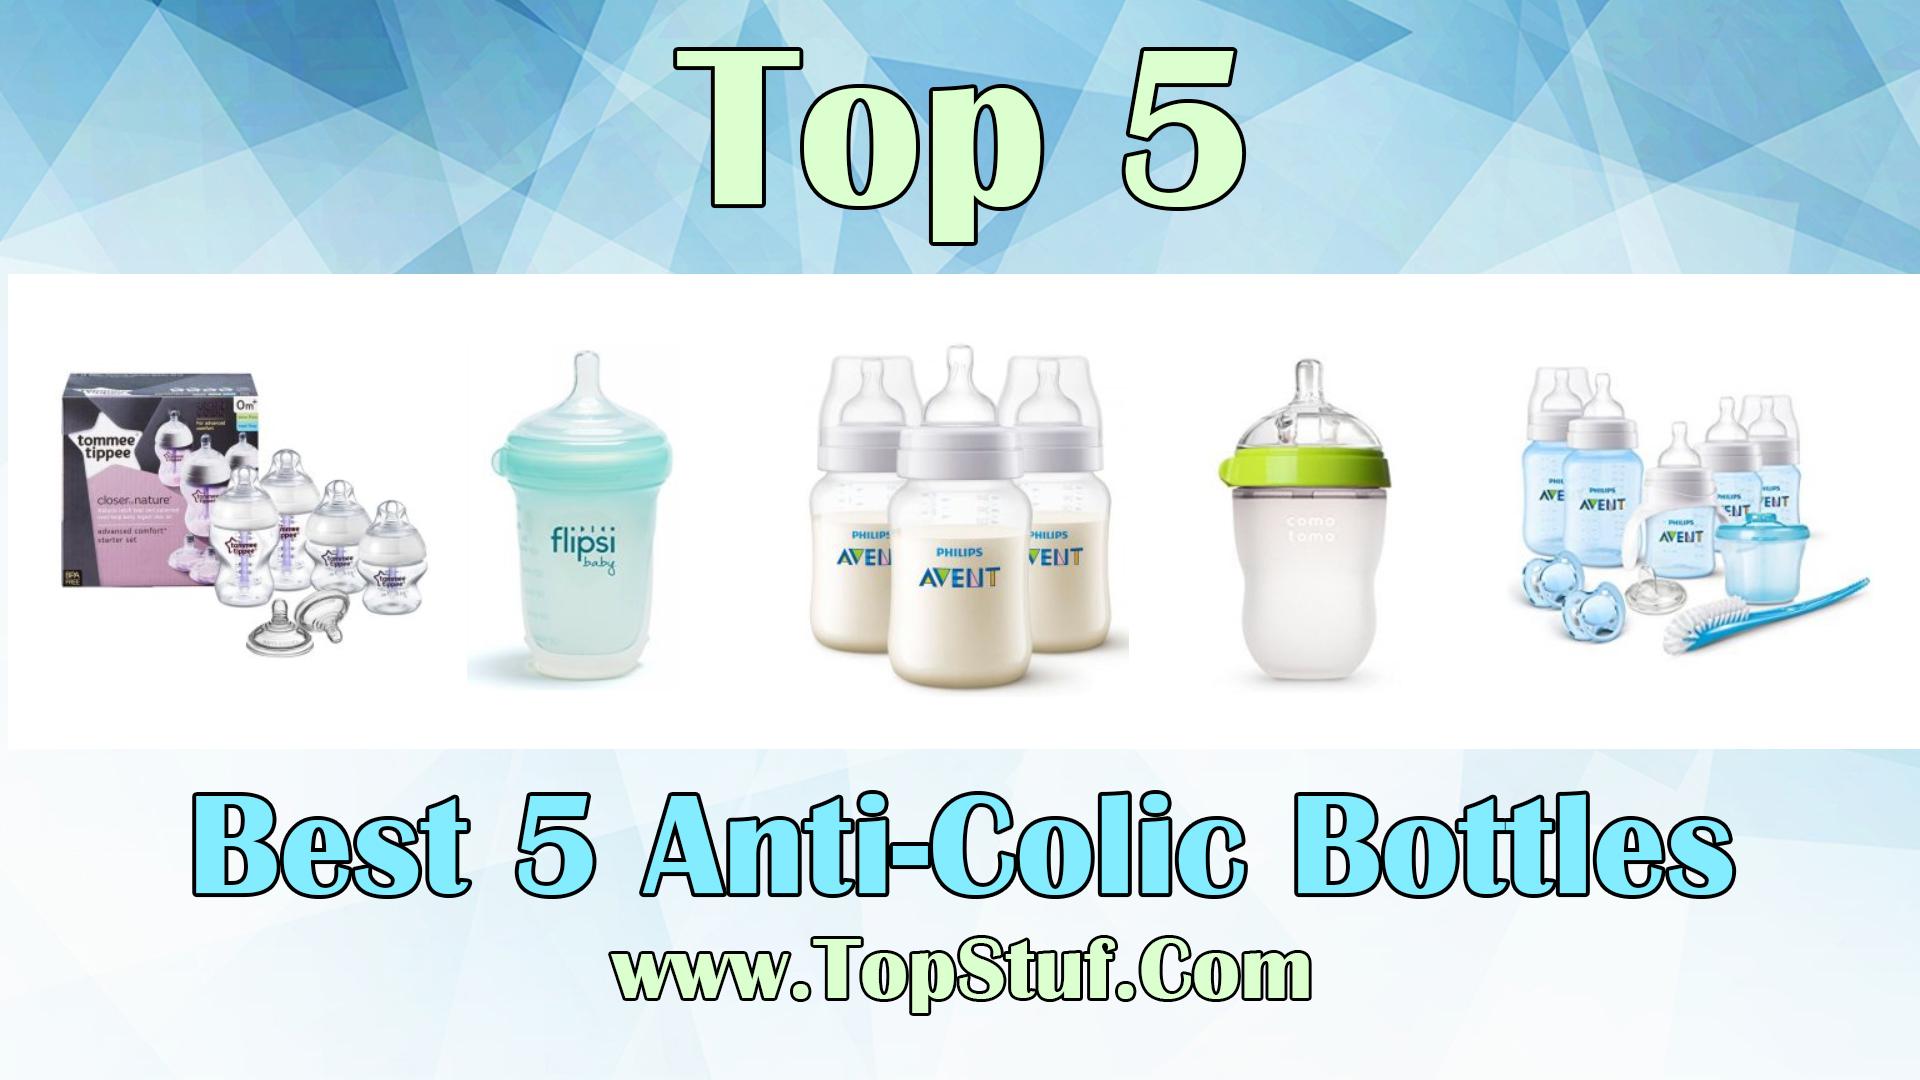 Best Anti-Colic Bottles